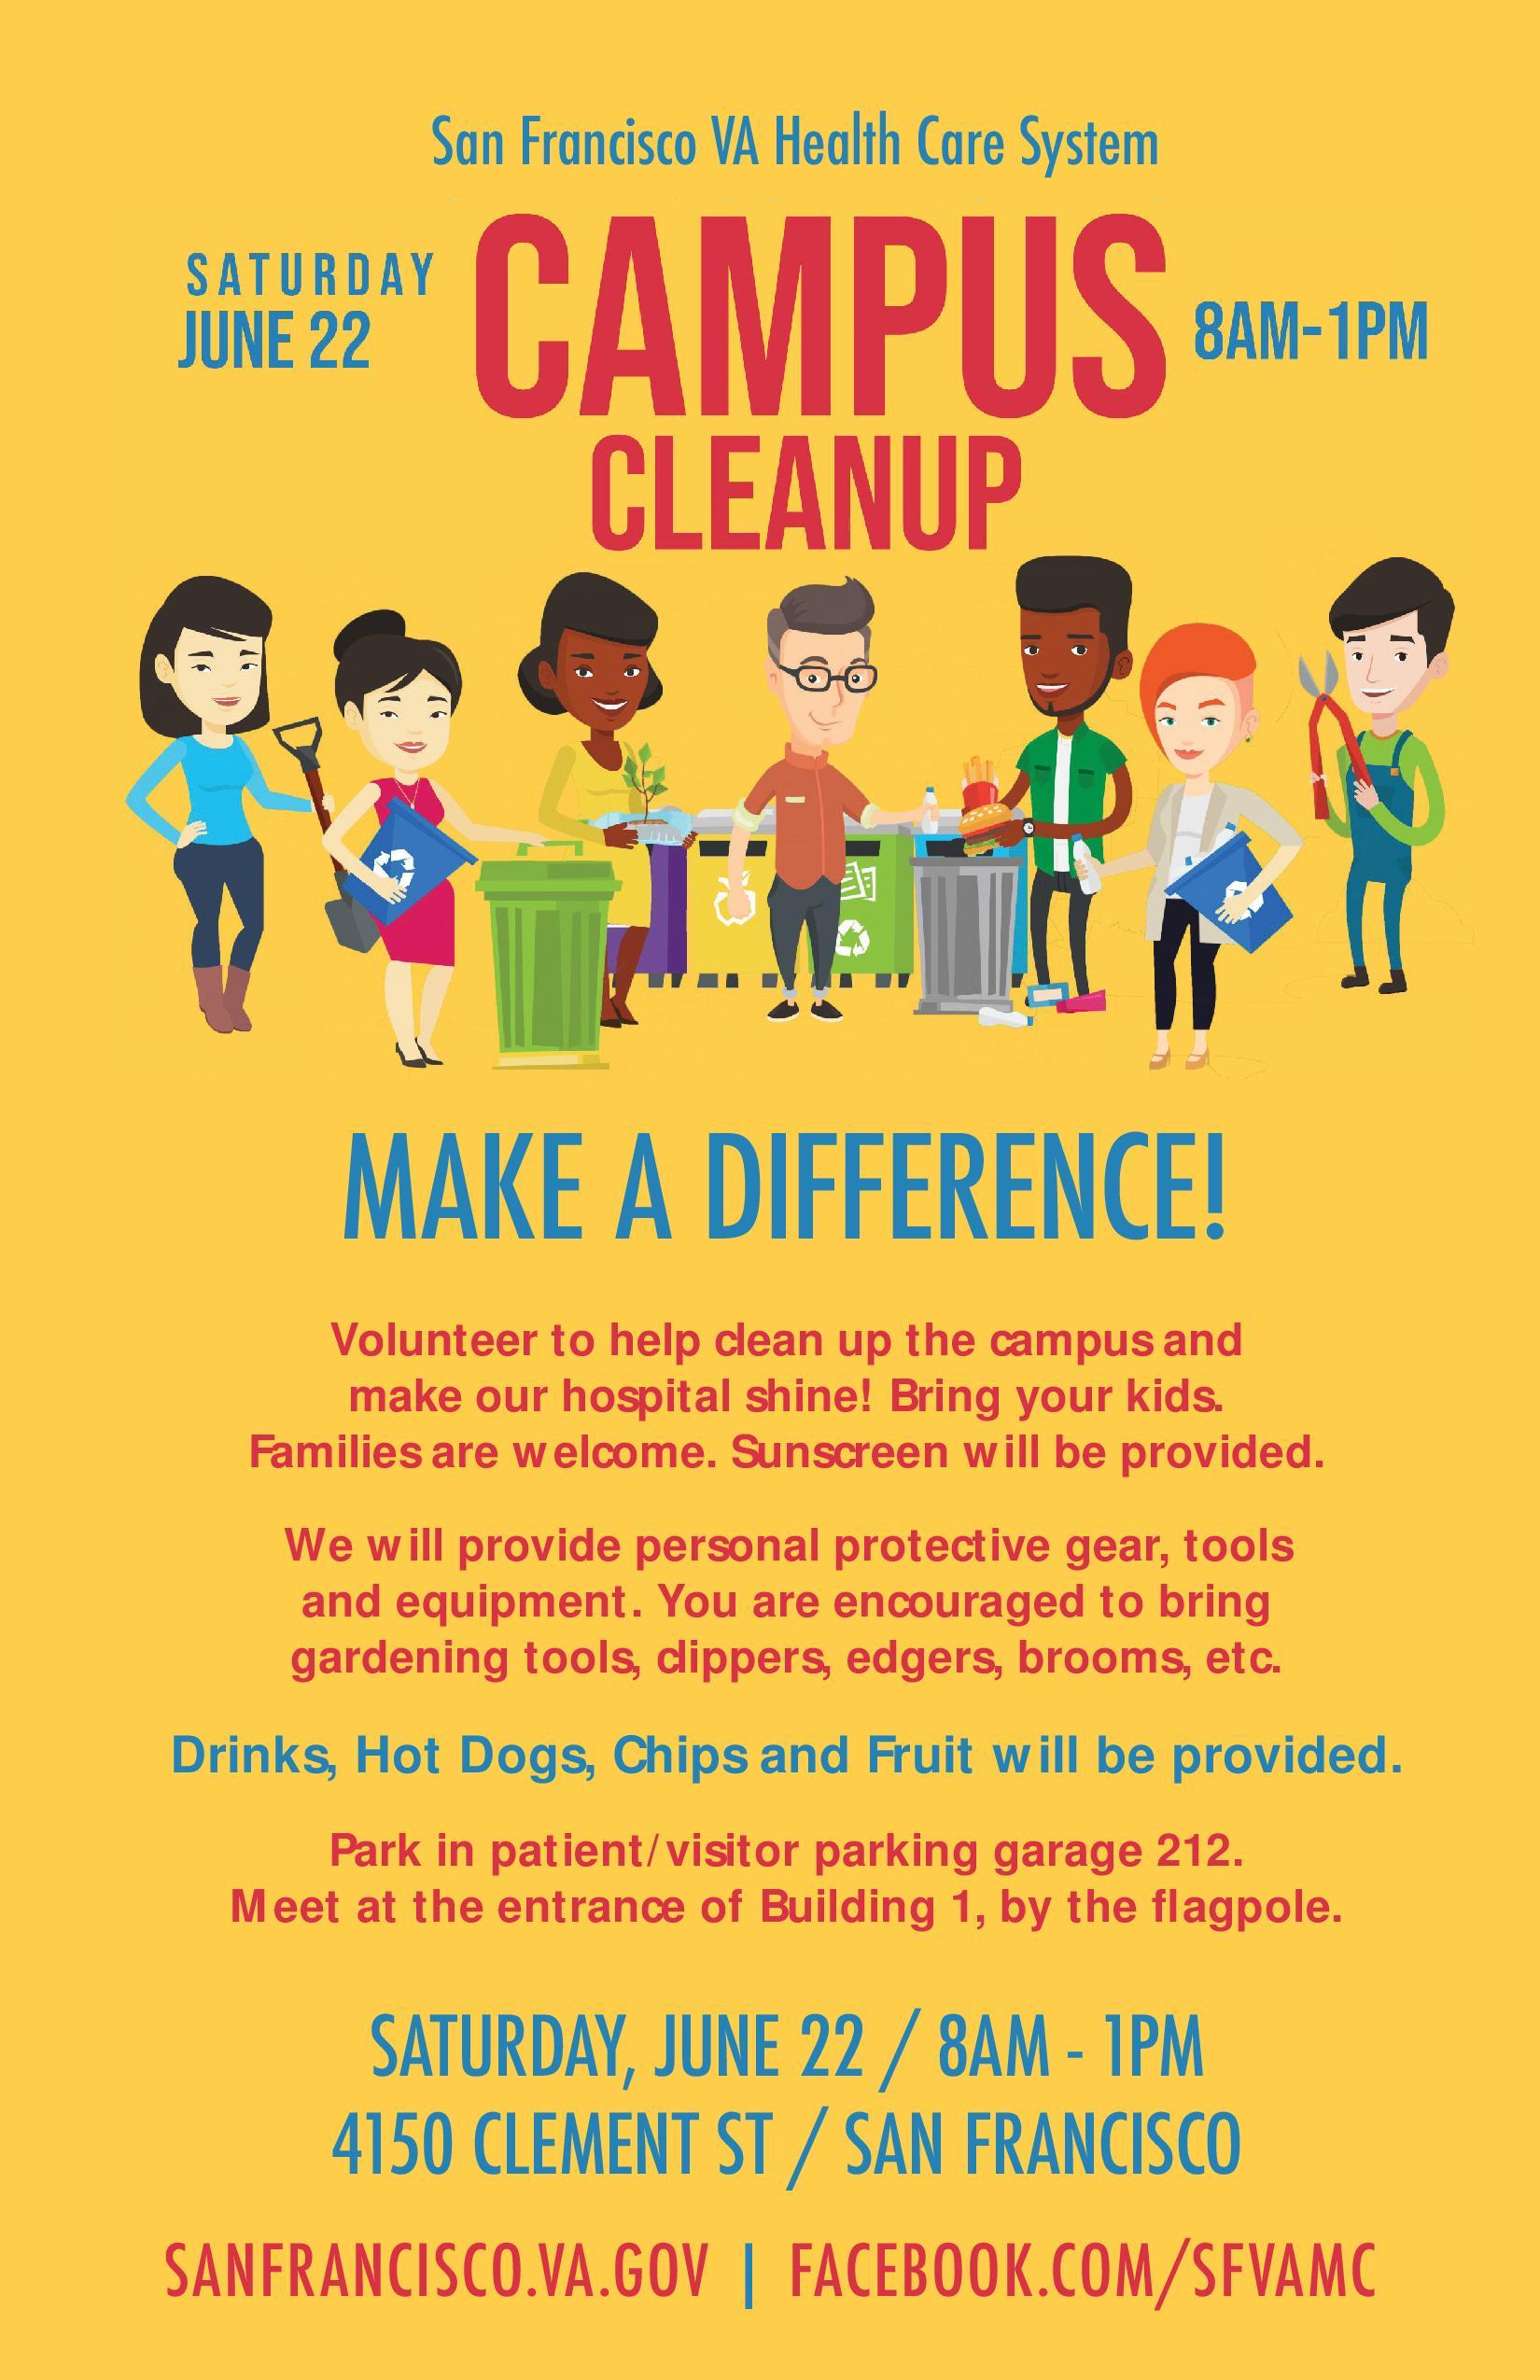 Campus_Cleanup-page-001.jpg